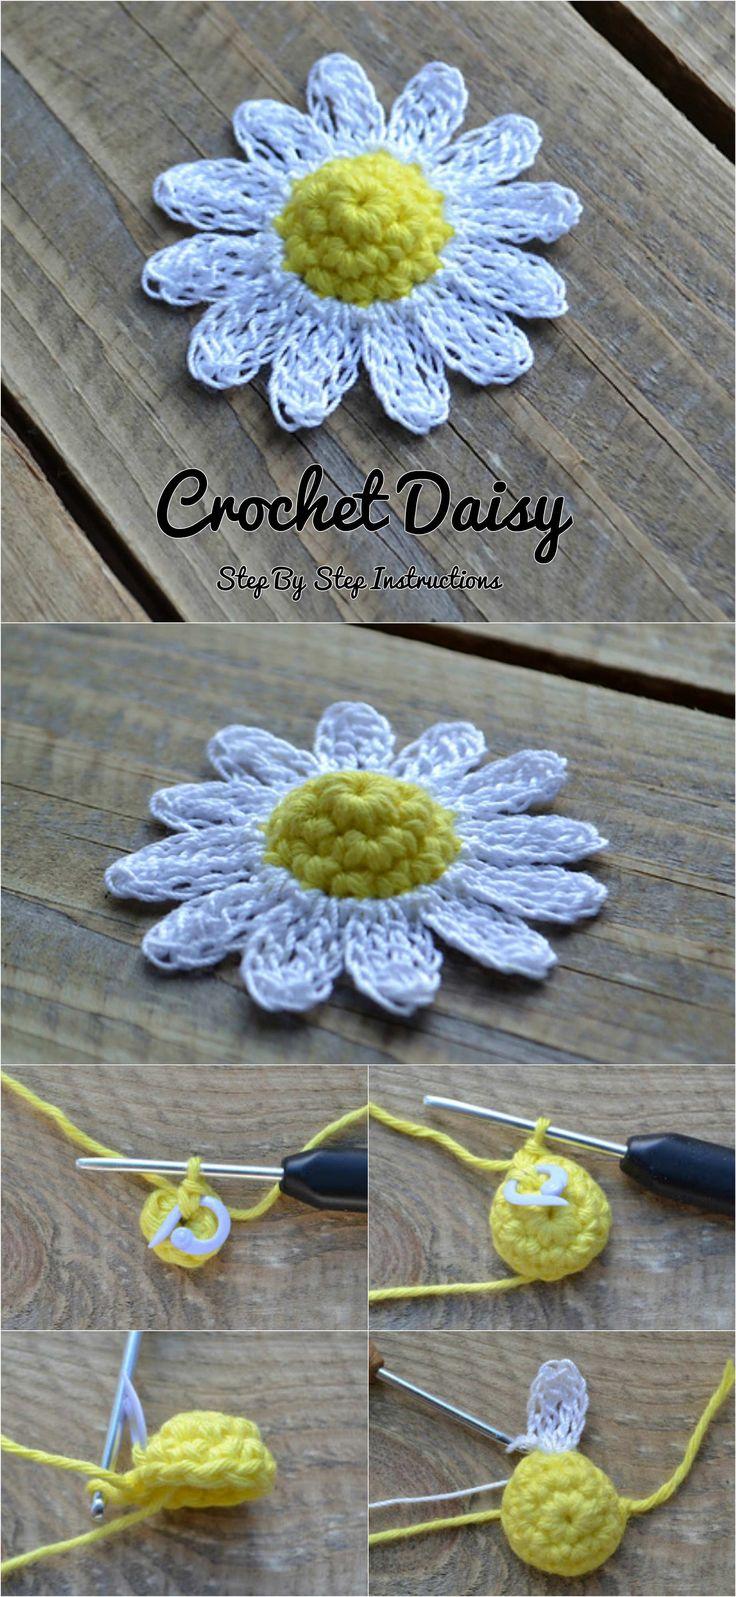 Crochet Daisy Flower